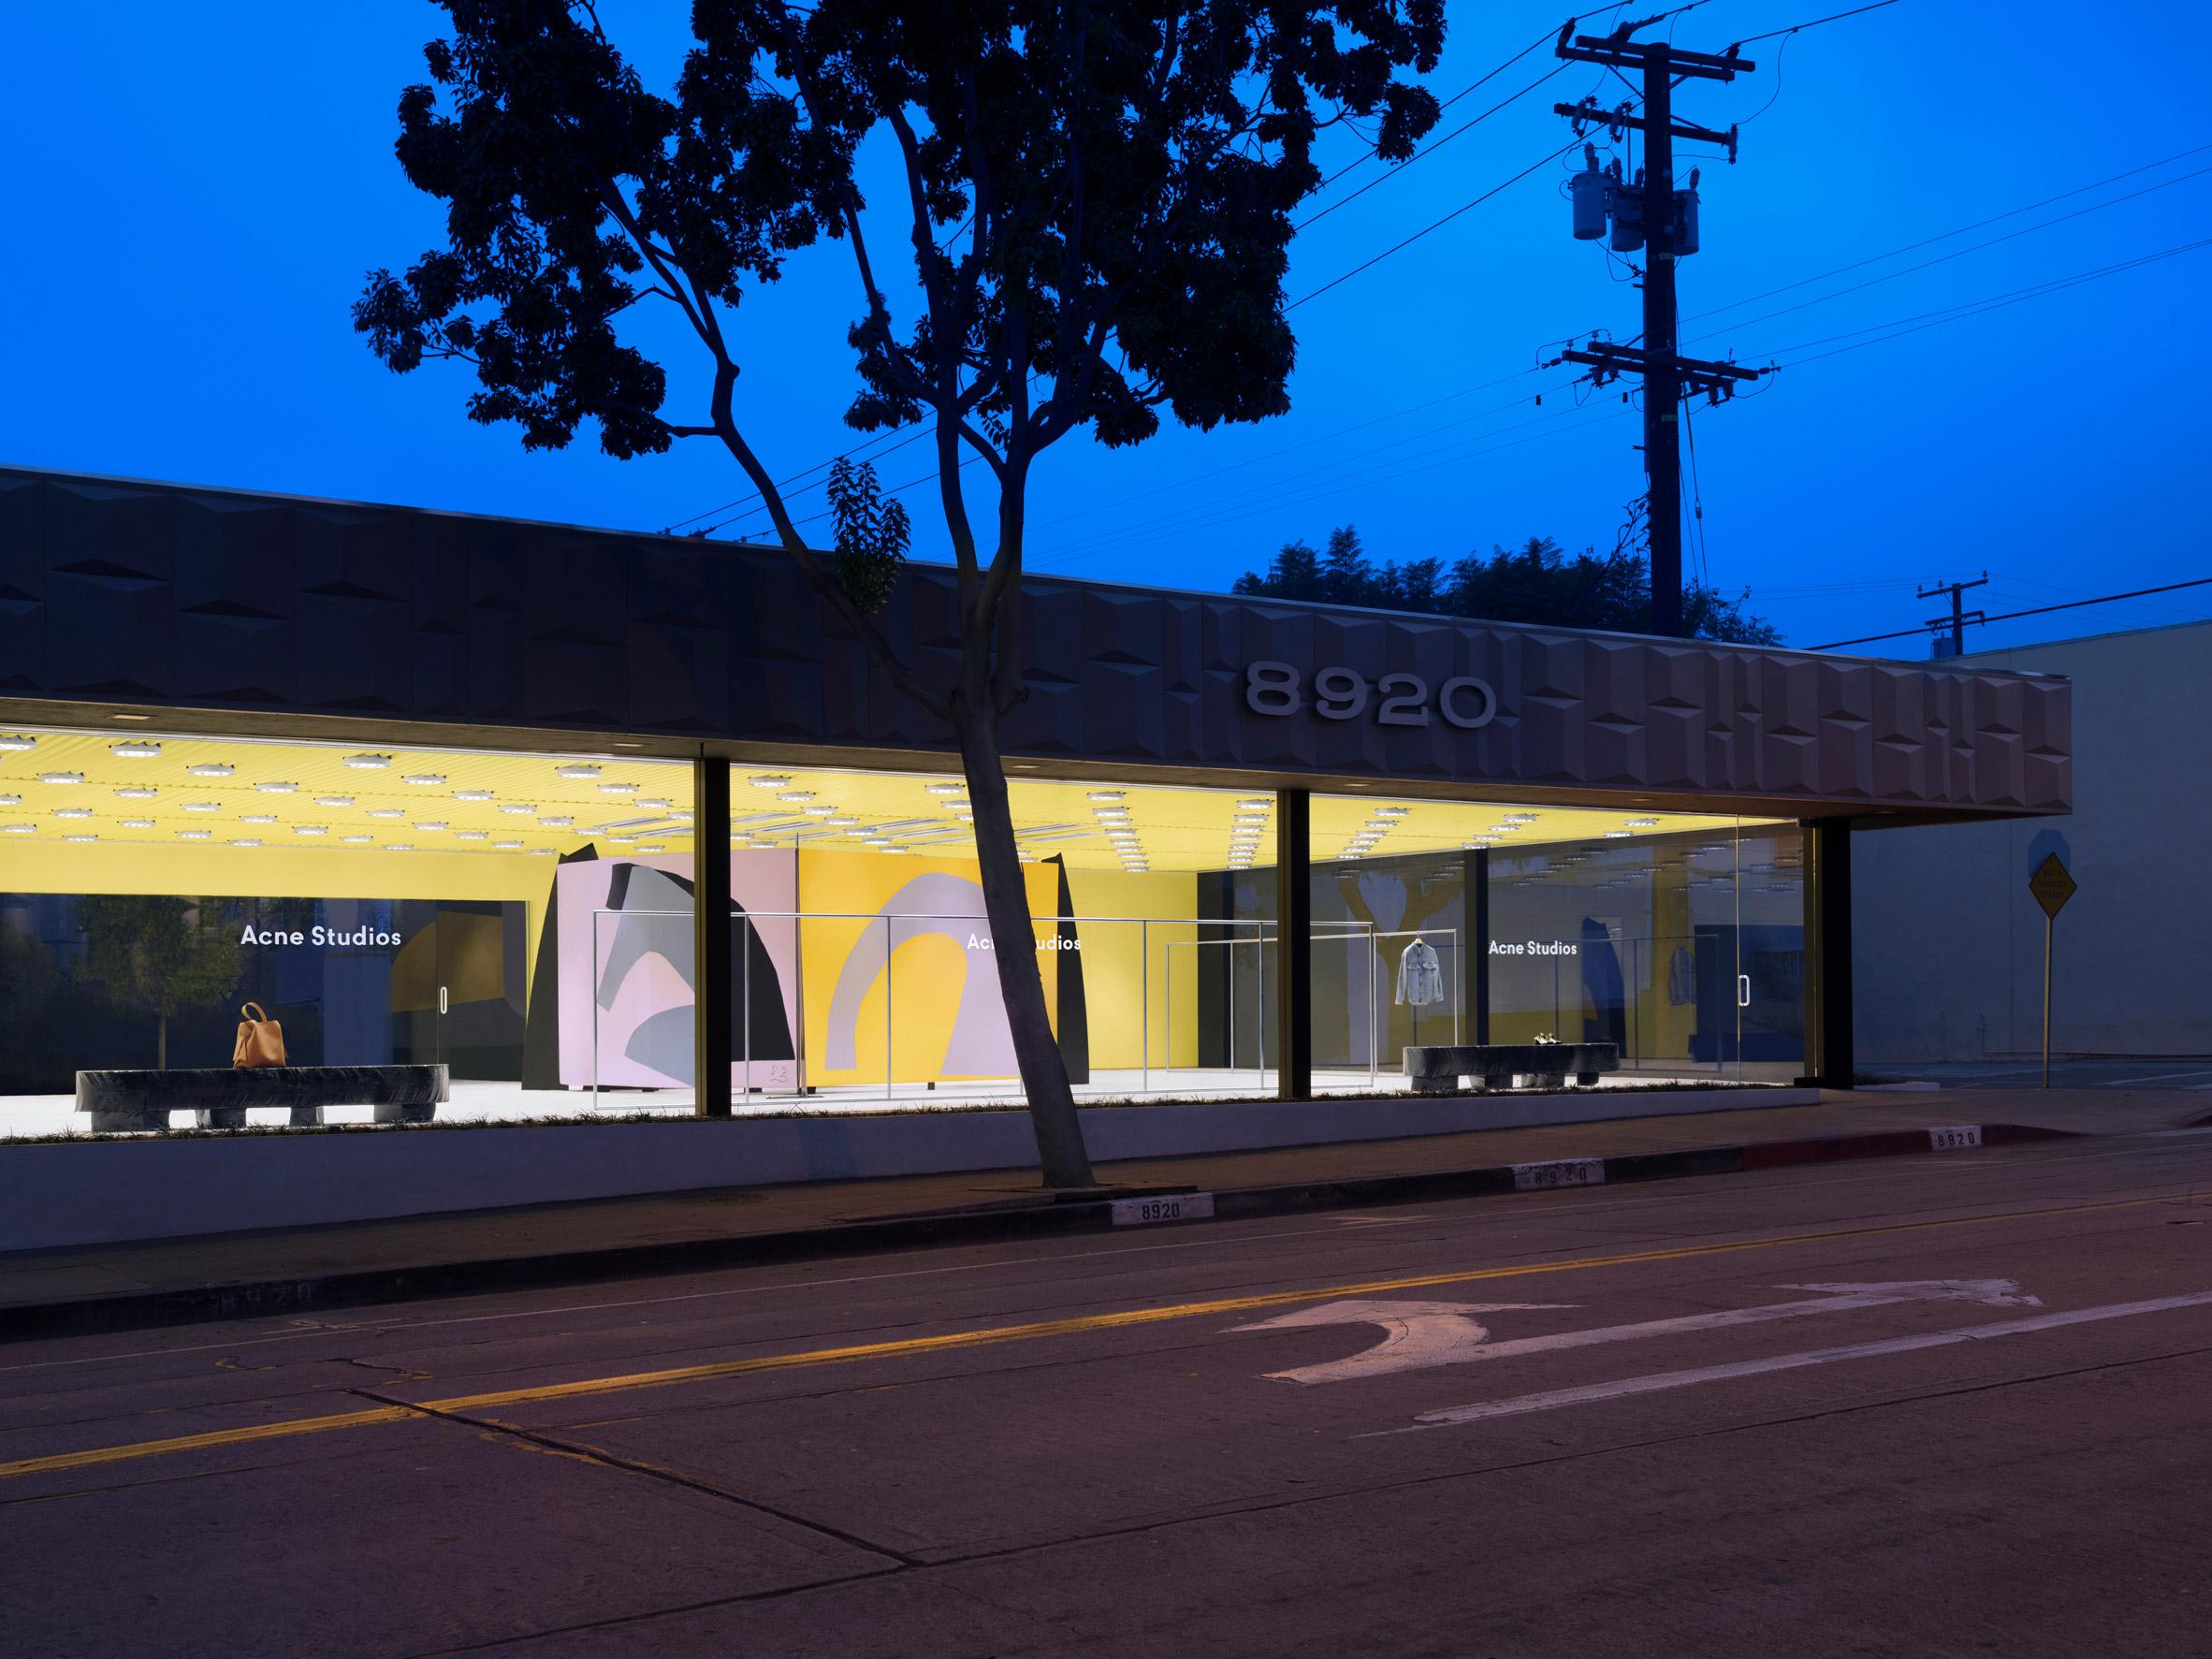 acne-west-hollywood-interiors-retail-yellow-california-usa_dezainaa_3.jpg